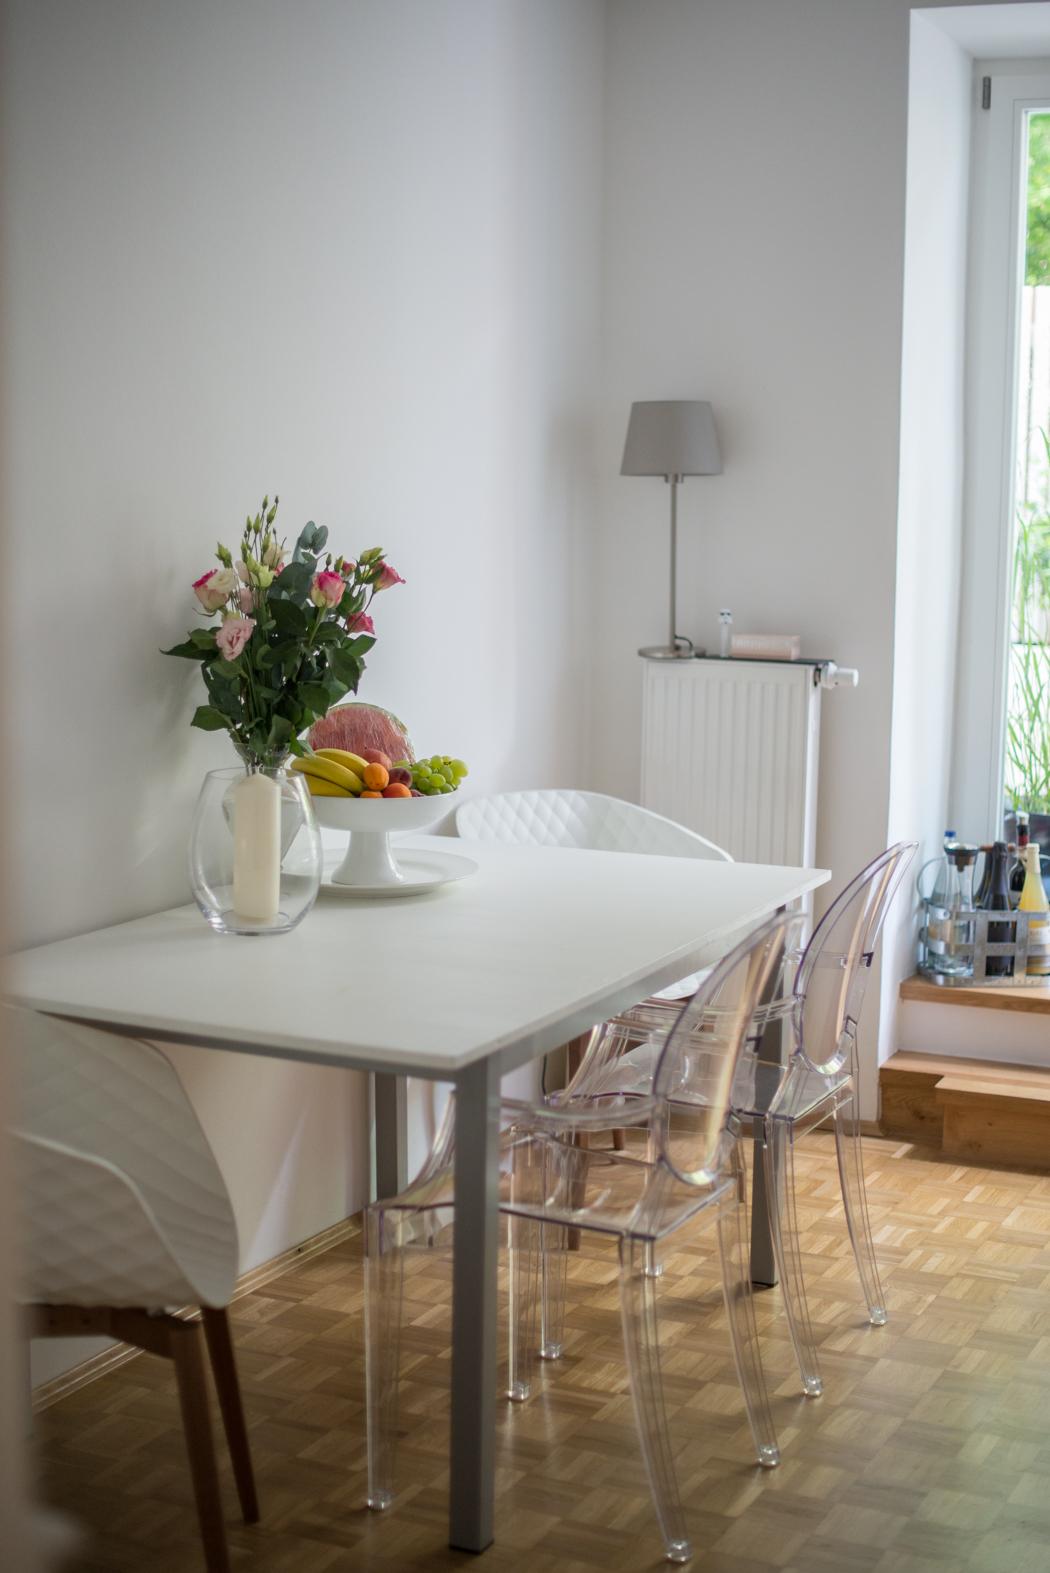 interior k che lindarella fashion und fitness blog aus m nchen. Black Bedroom Furniture Sets. Home Design Ideas